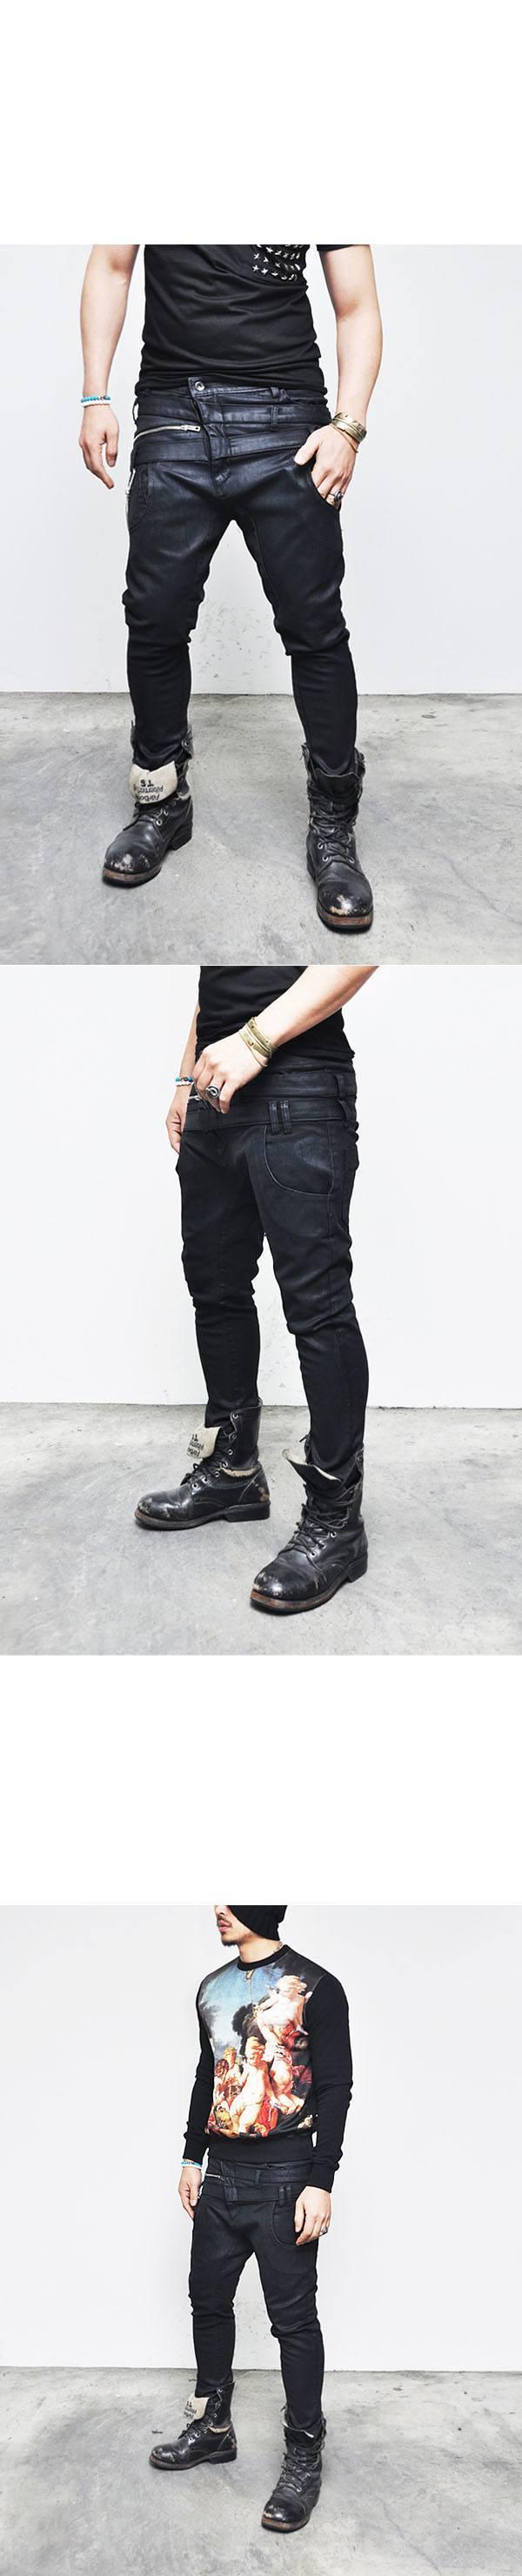 Shinny Jeans BOys